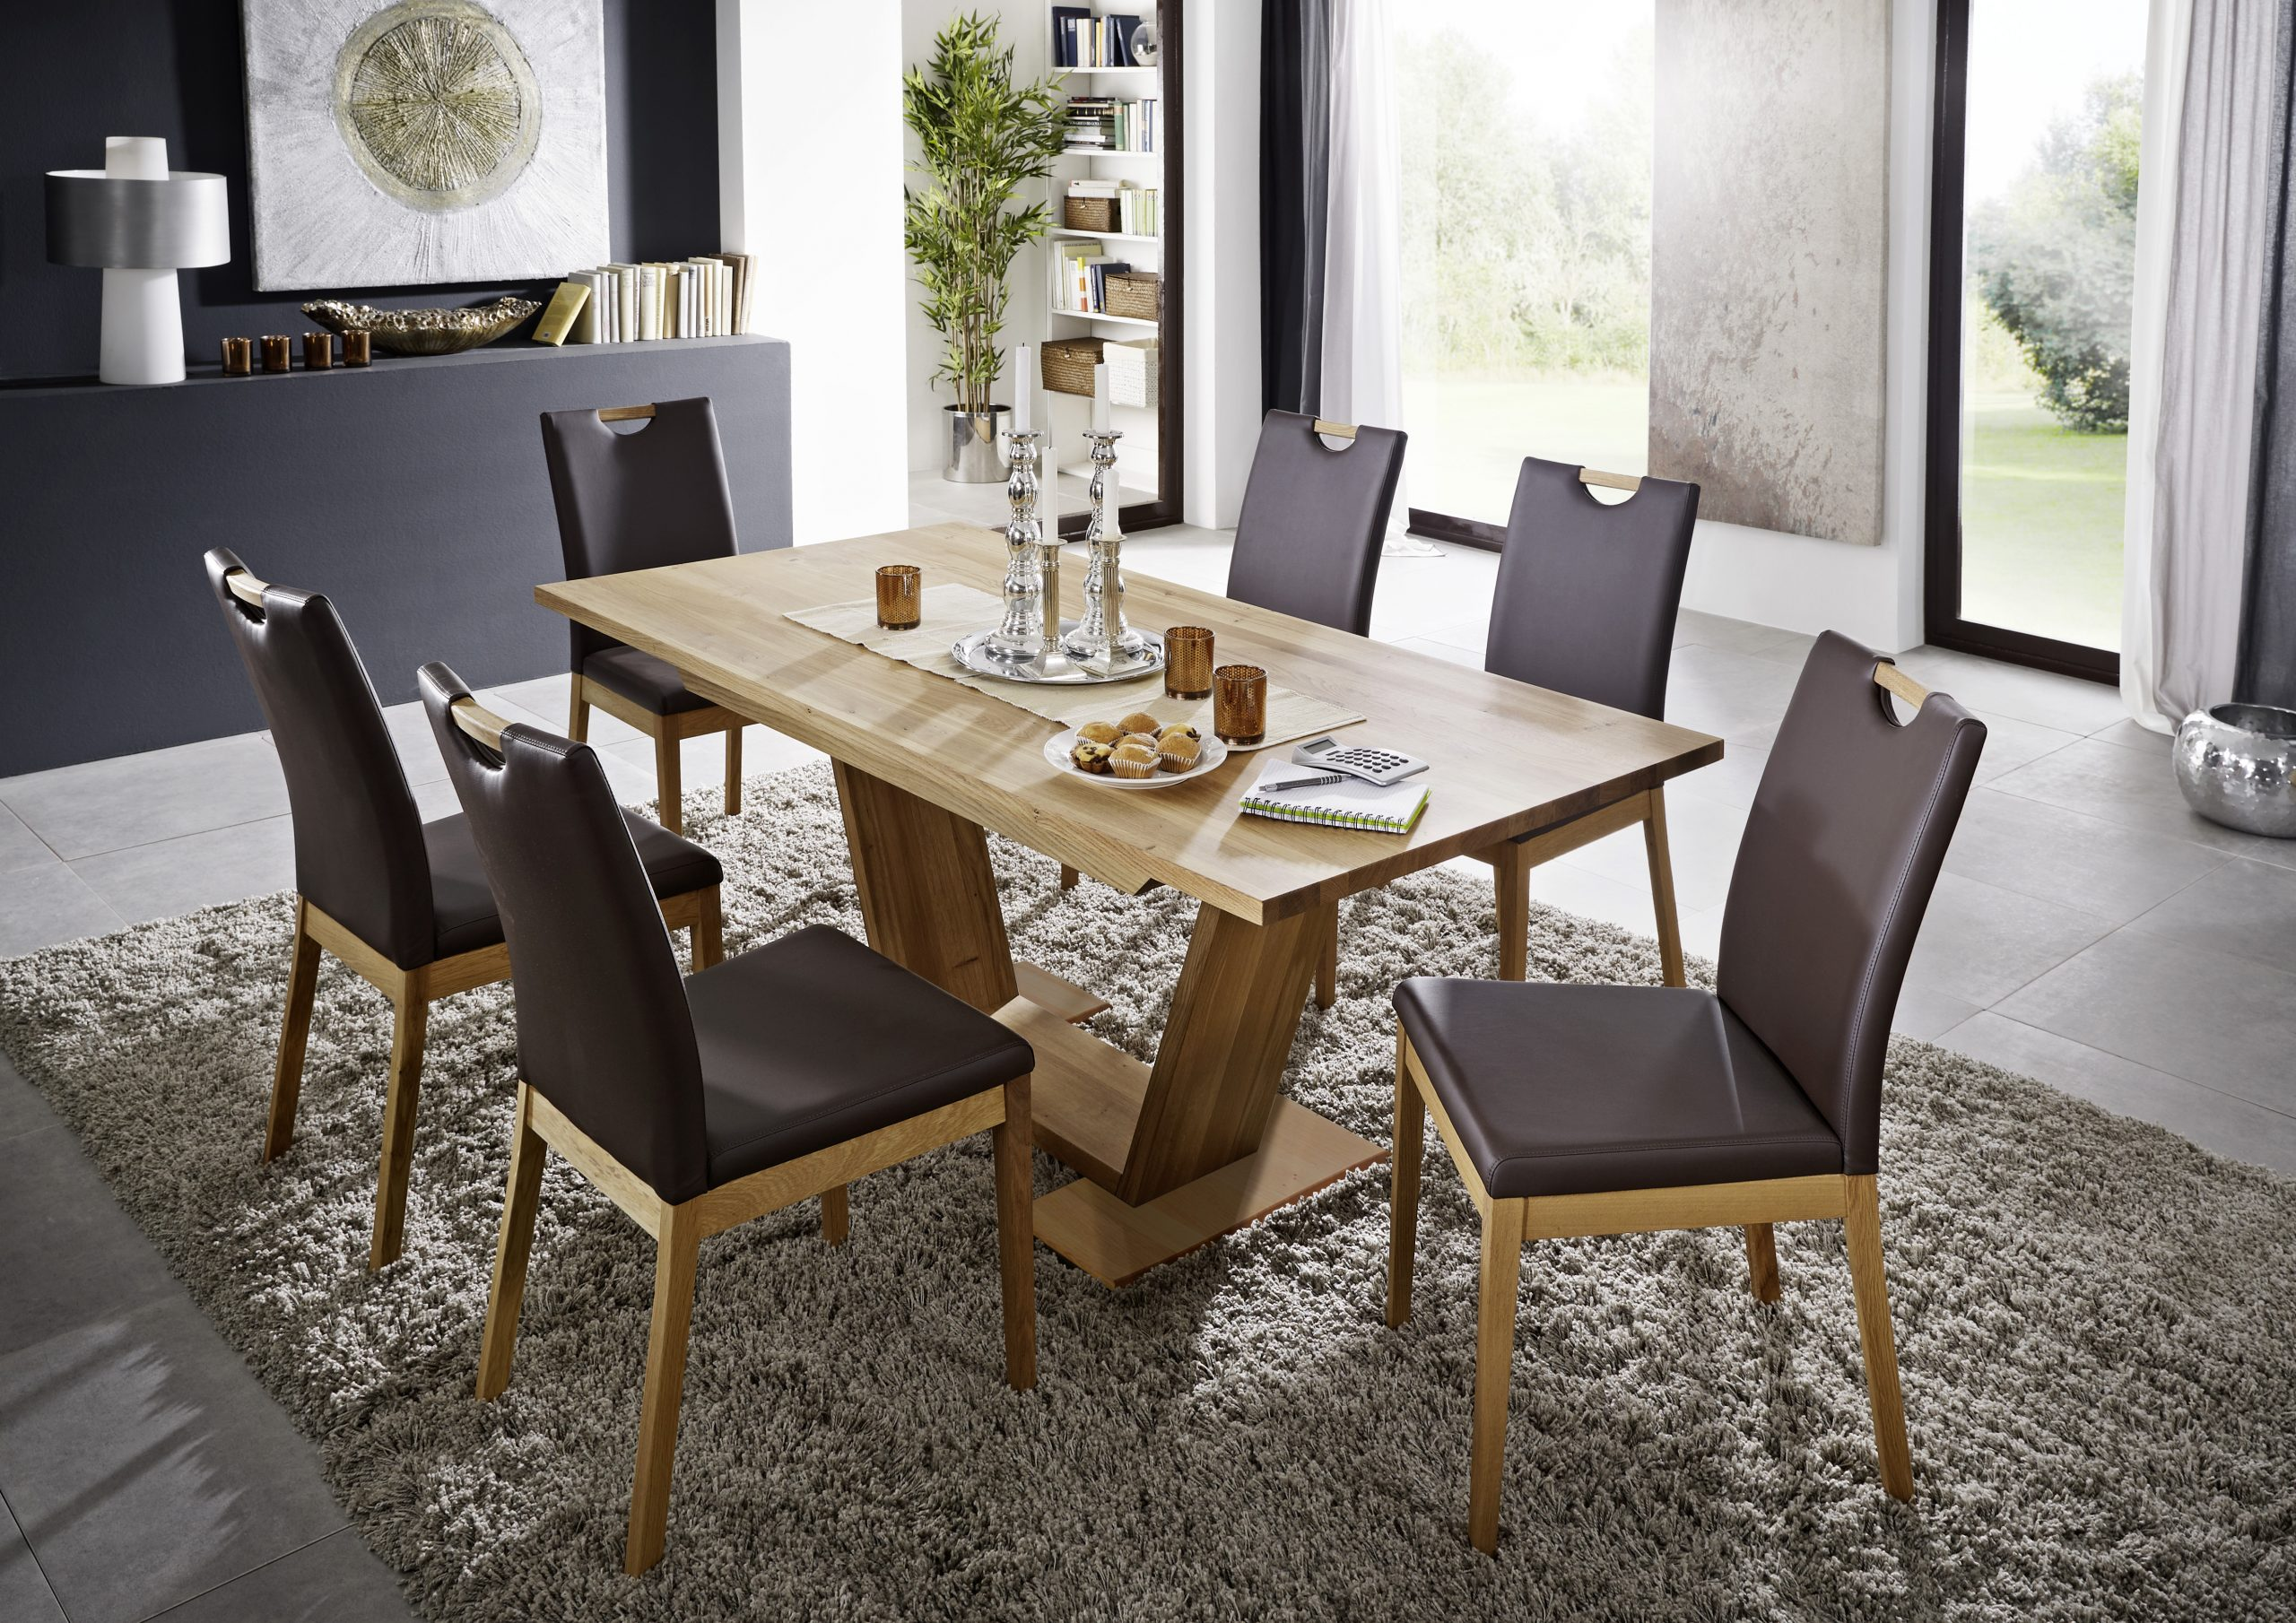 Tischgruppe Massivholz Wildeiche Palma